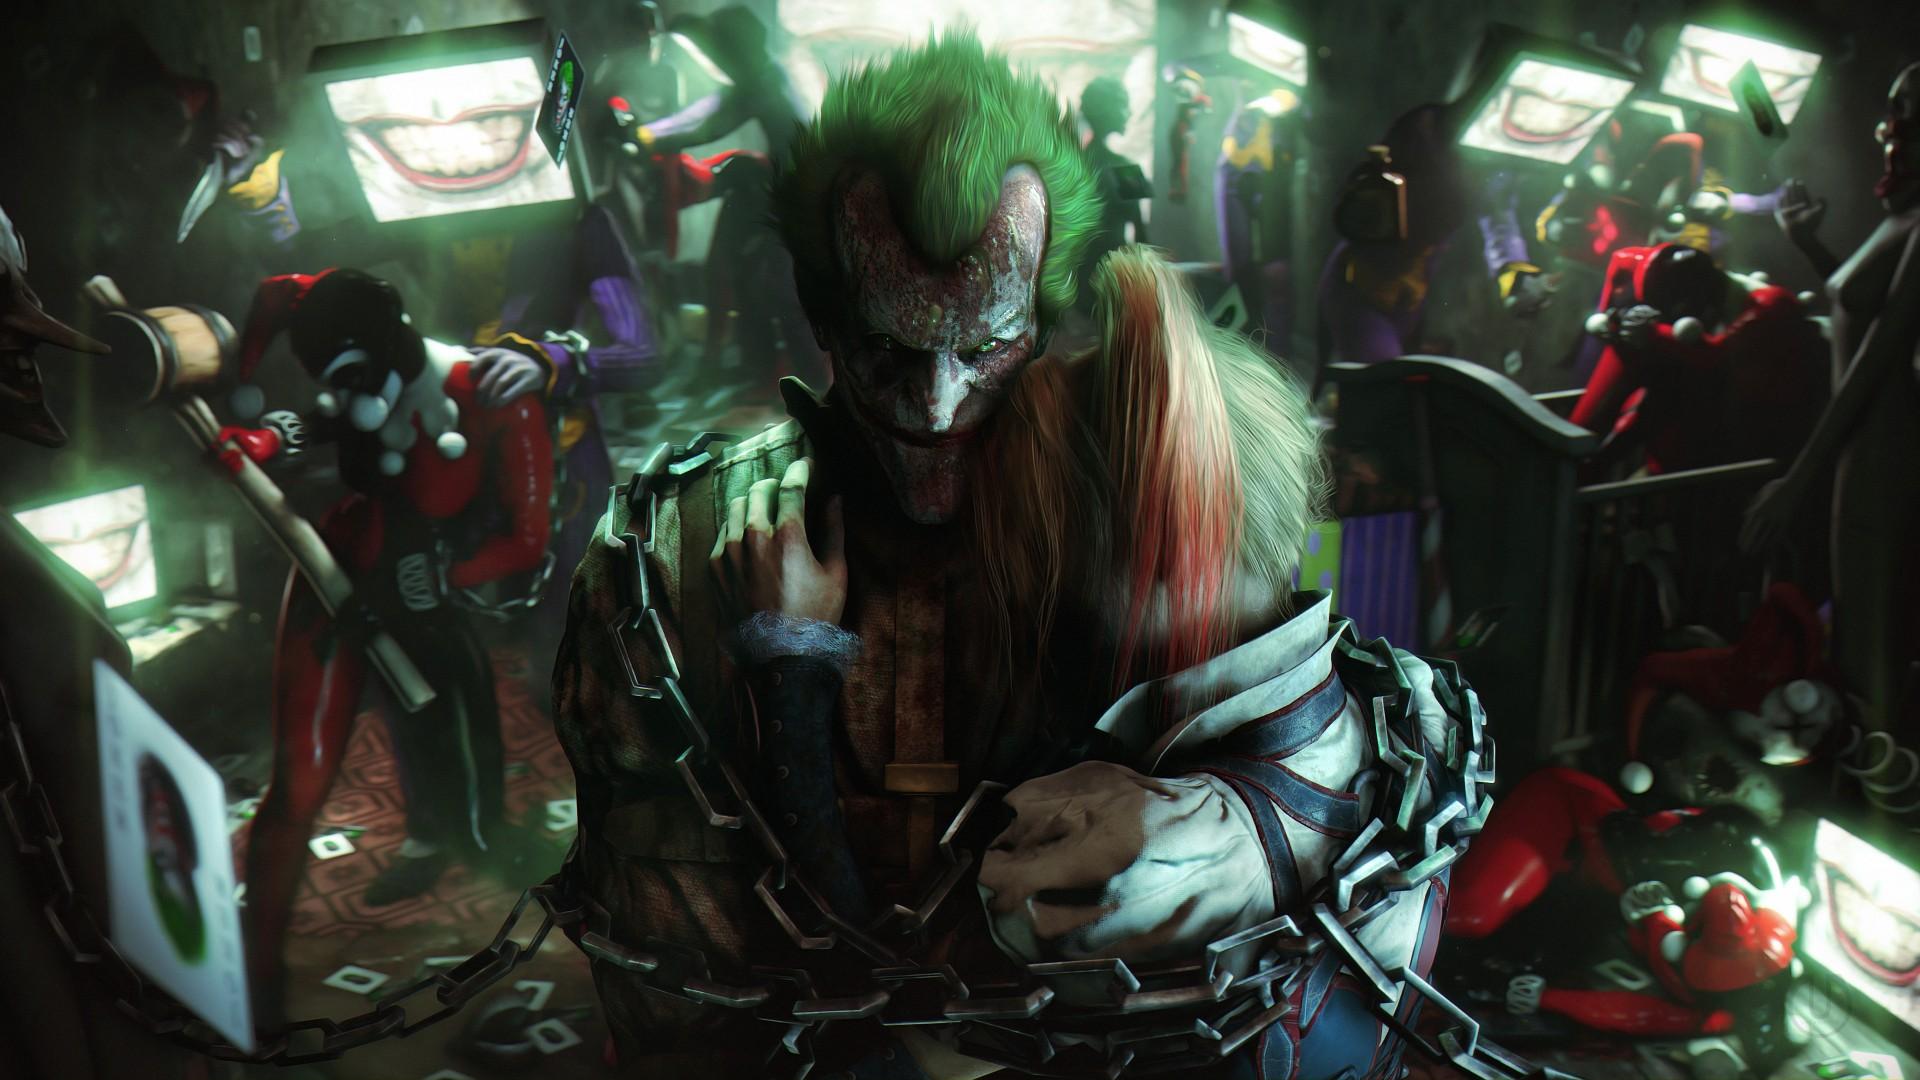 Game Cars Hd Wallpapers Joker Harley Quinn Artwork 4k Wallpapers Hd Wallpapers